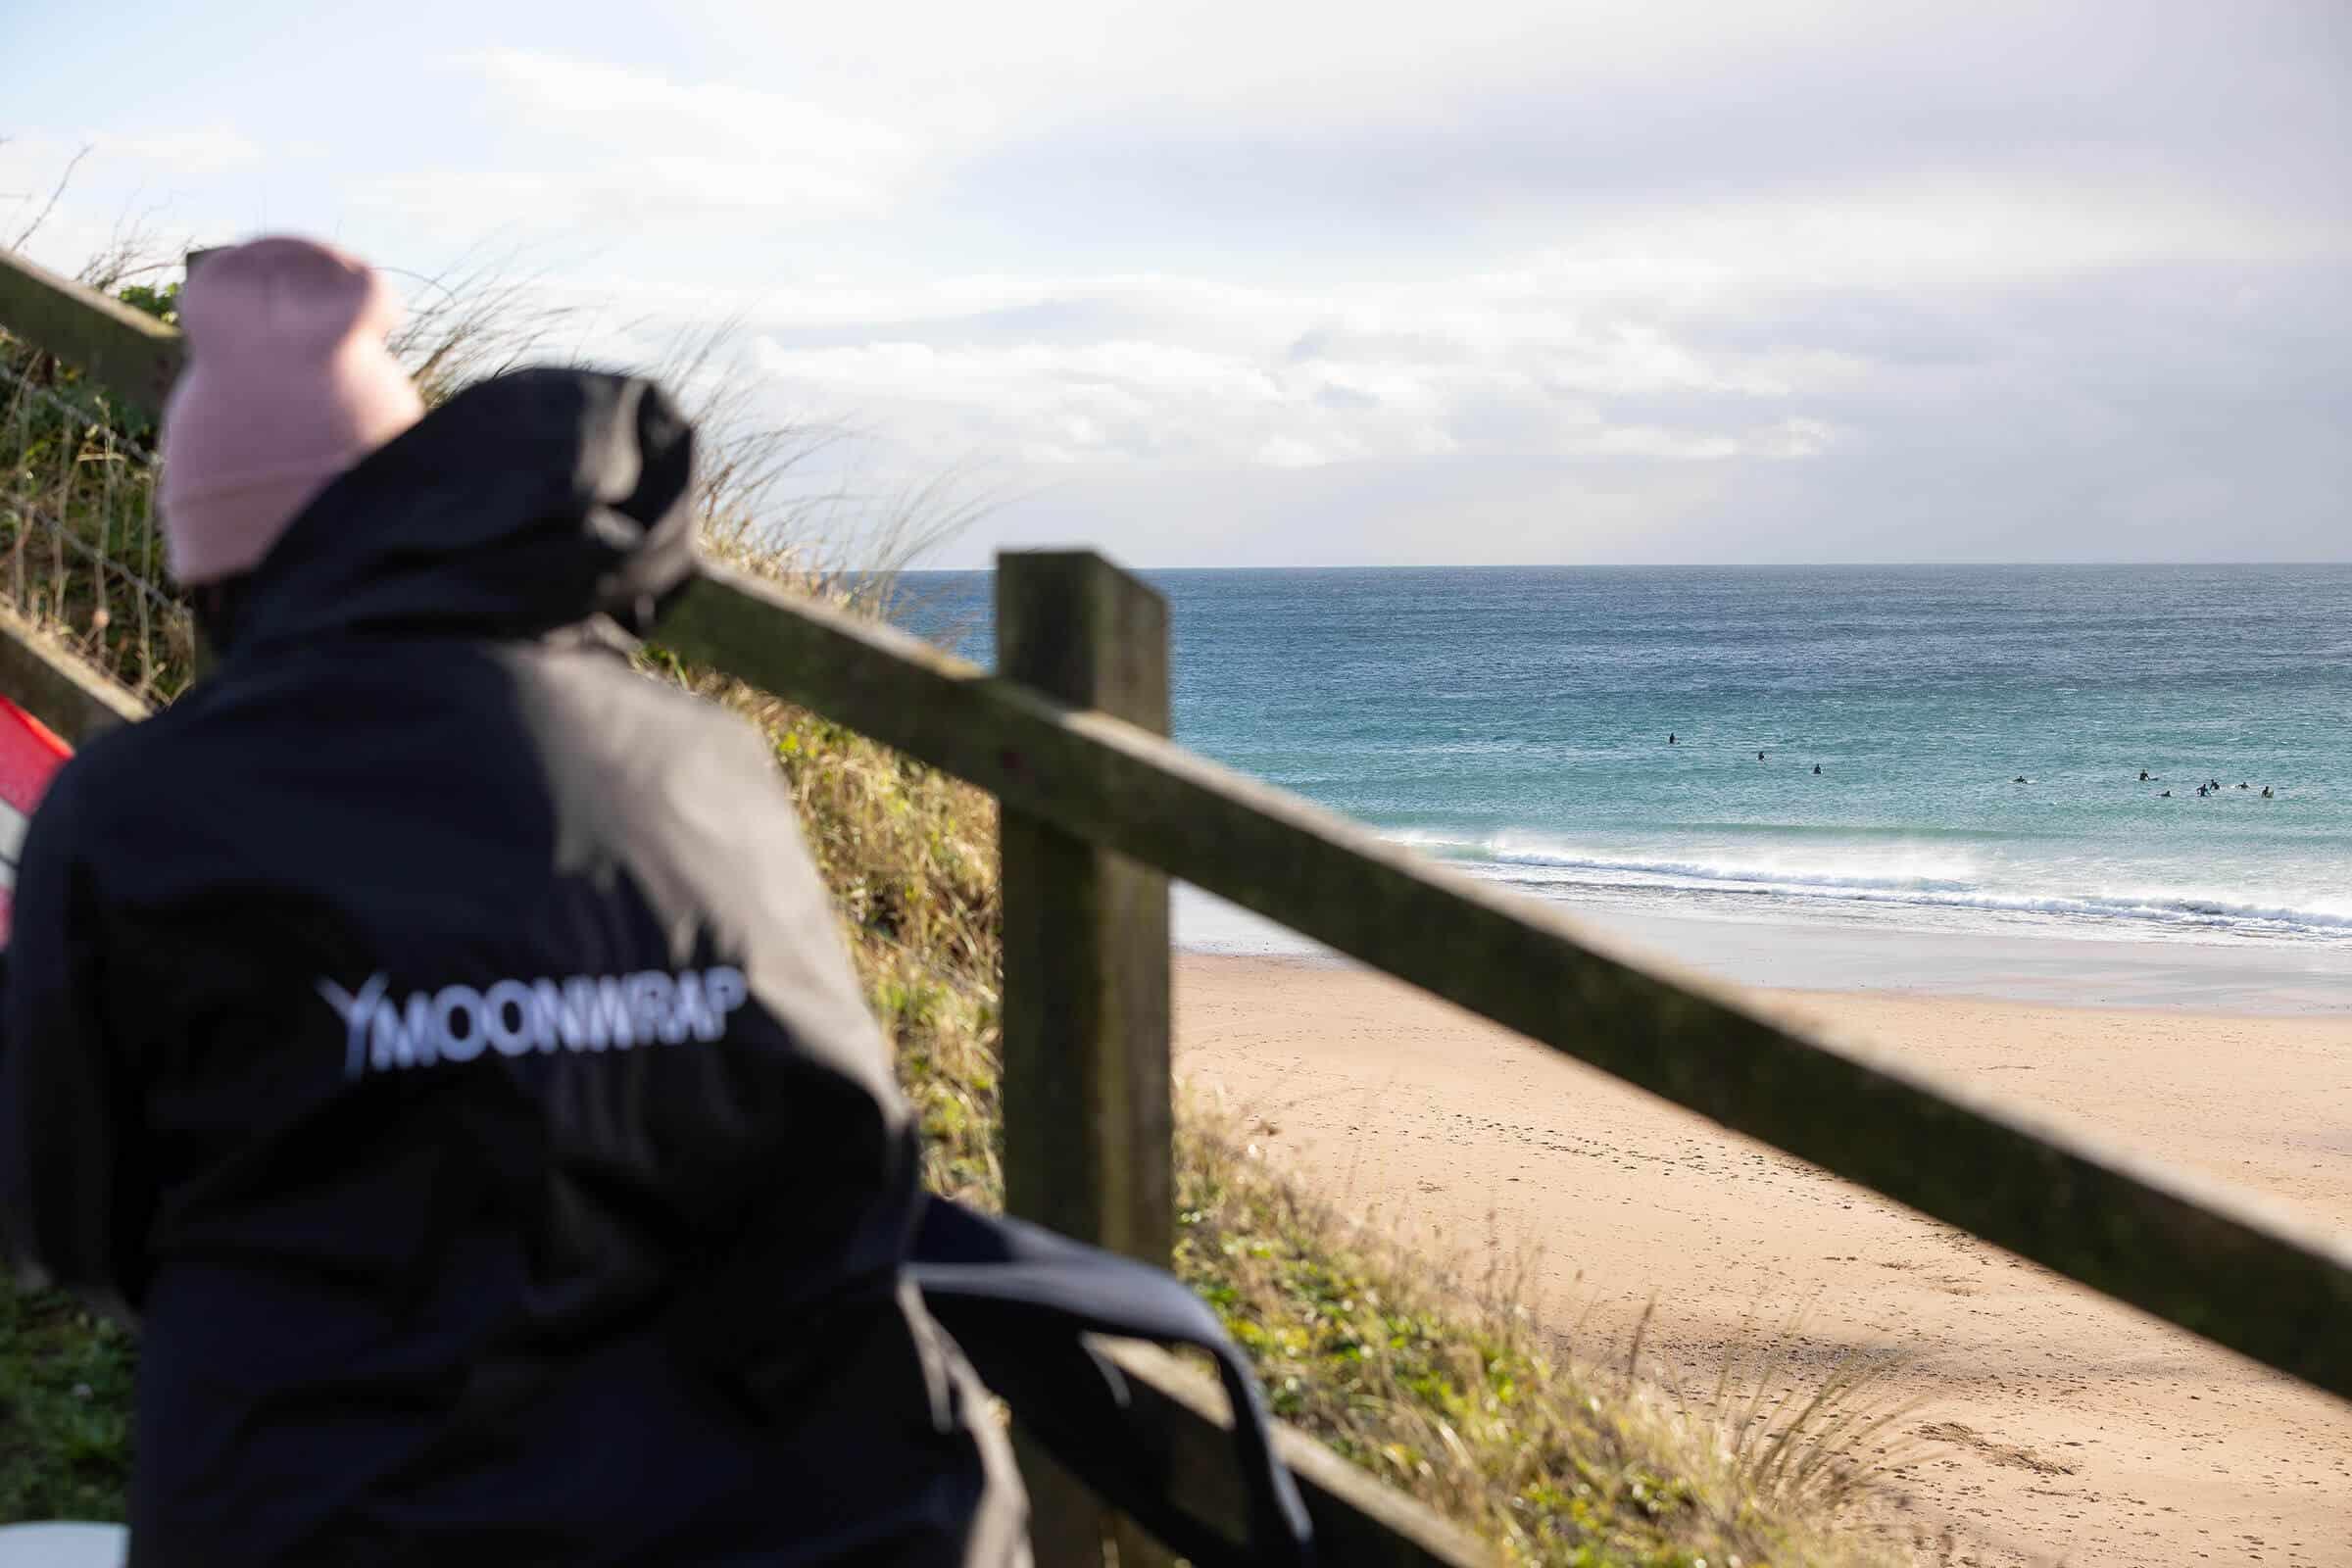 Moonwrap-beach1.jpg